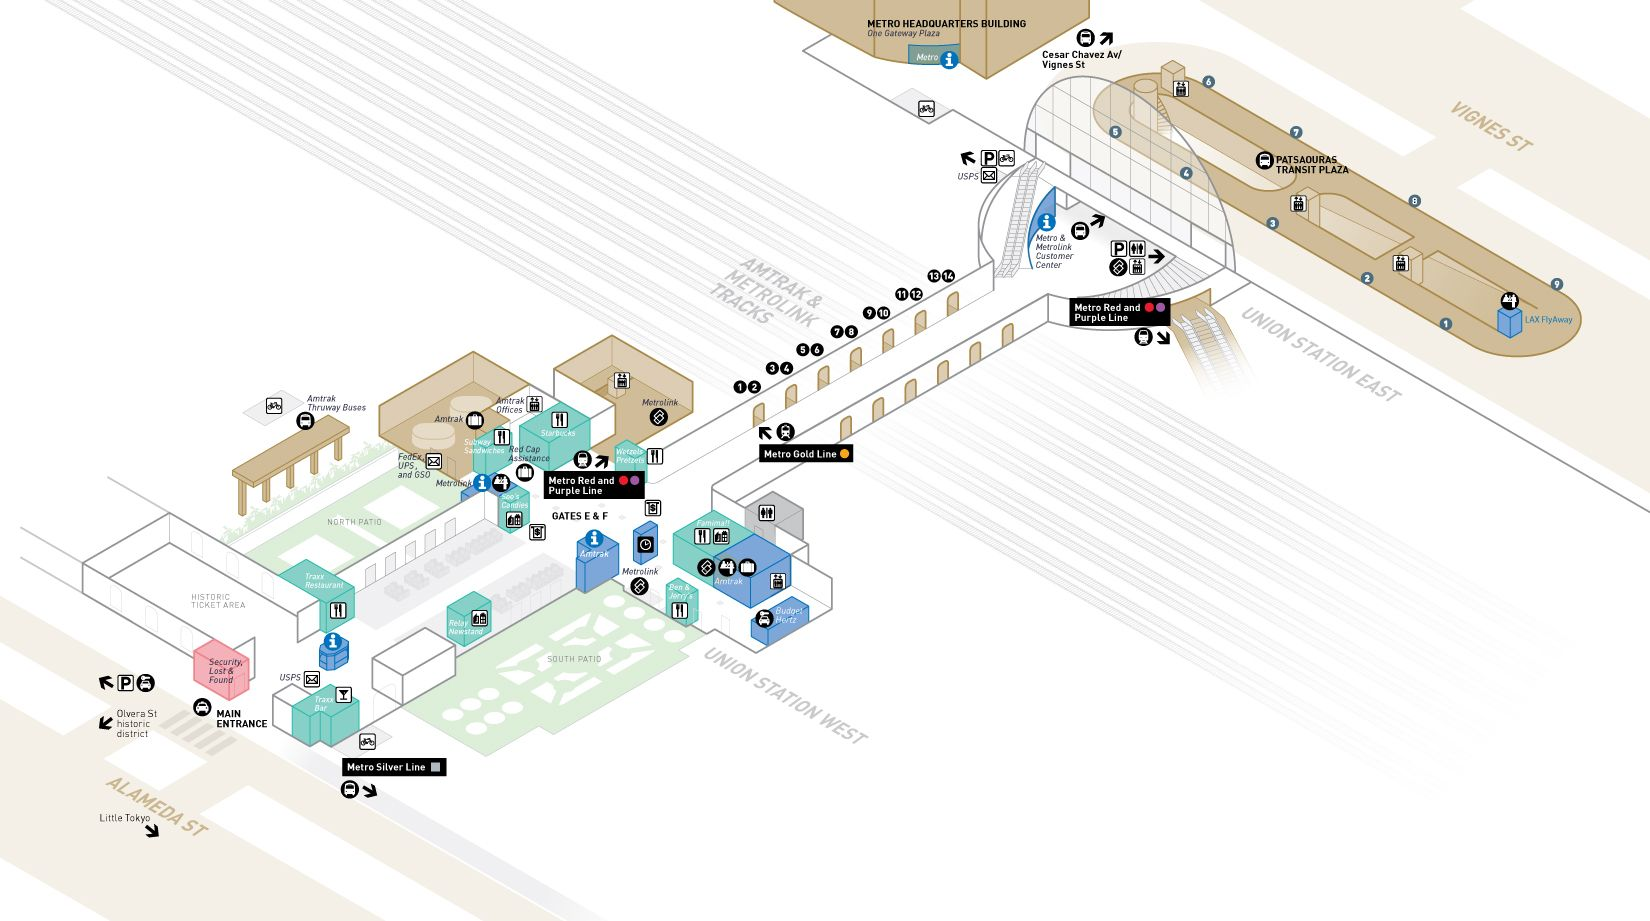 Union Station Union Station Station Map